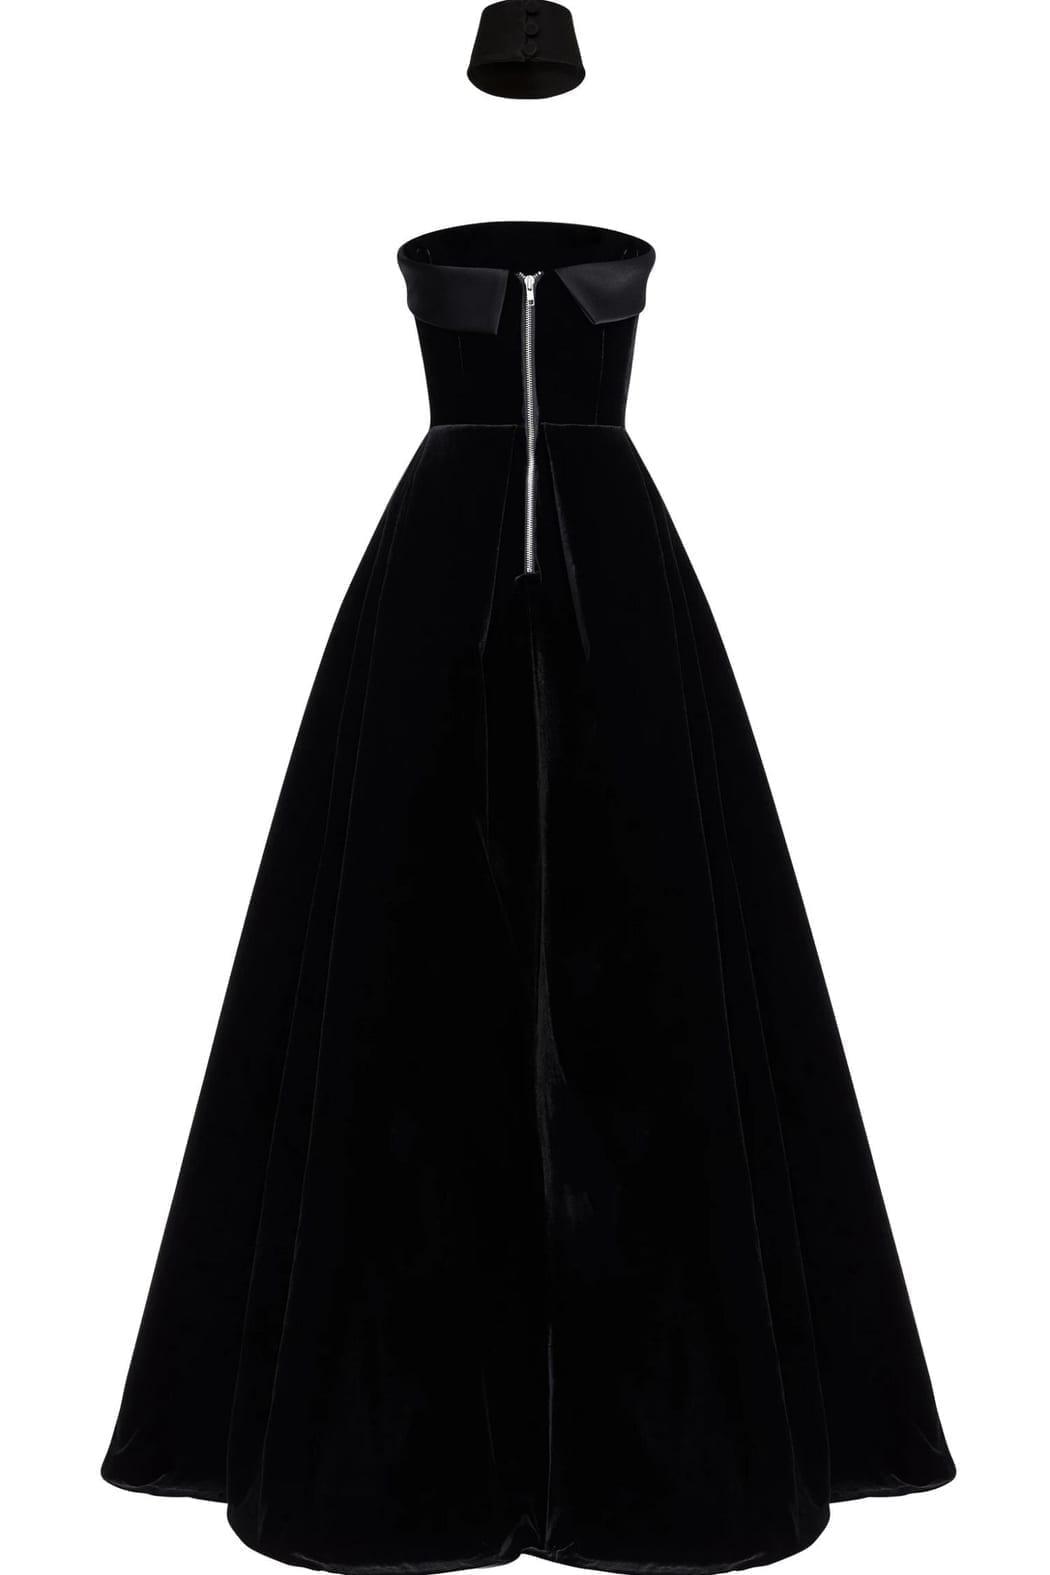 DISTRICT 5 BOUTIQUE Strapless Velvet Black Gown